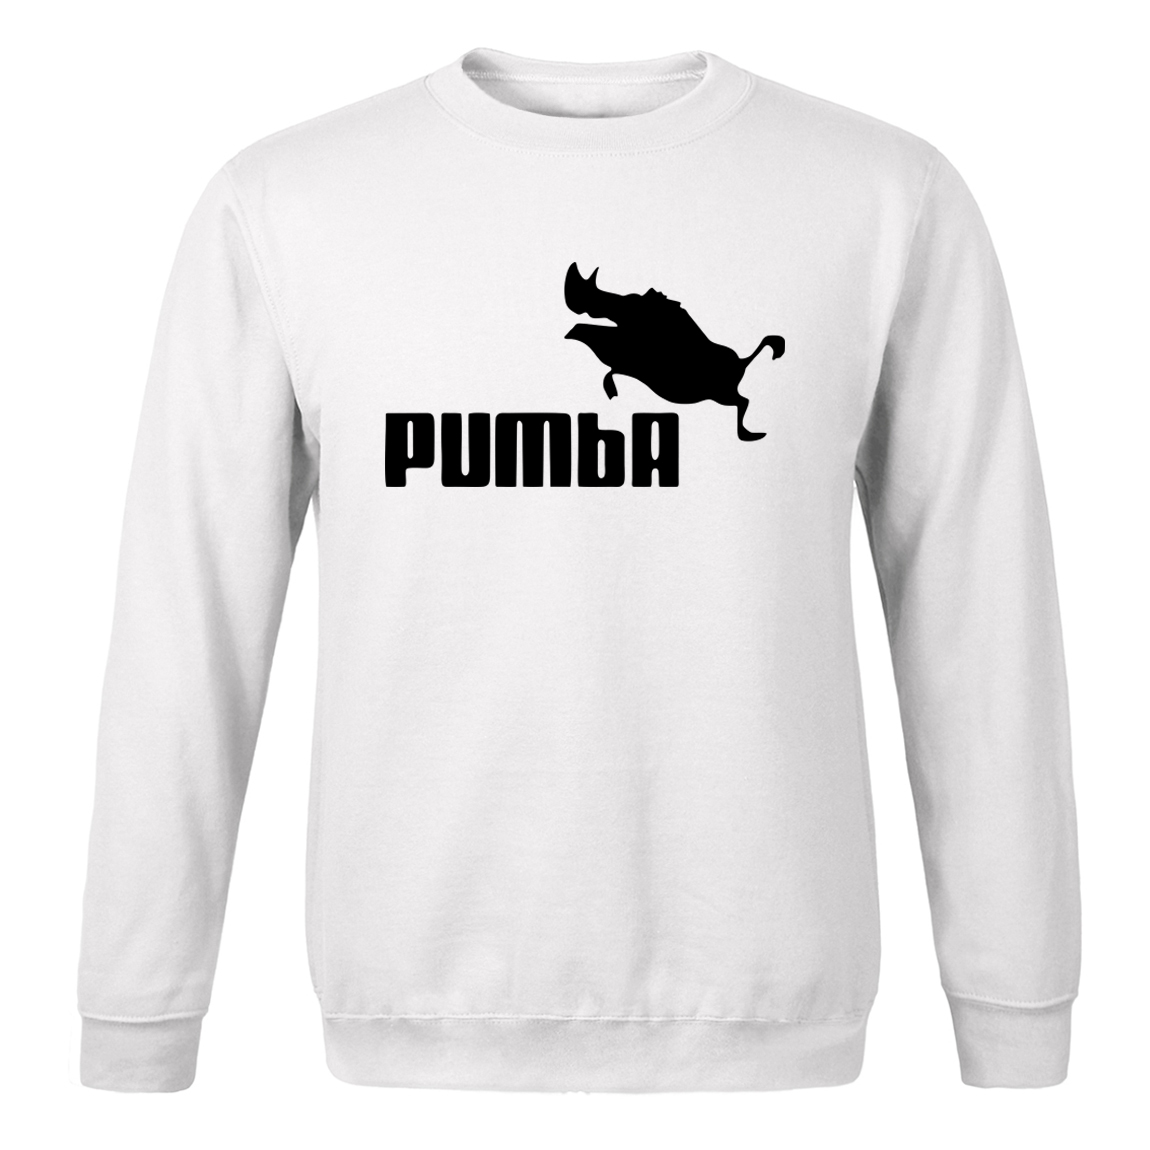 Brand Letter Print New Style Clothing Fashion Sweatshirt Men 2020 Spring Autumn Fahion Pullover Streetwear Male Fleece Hoodies